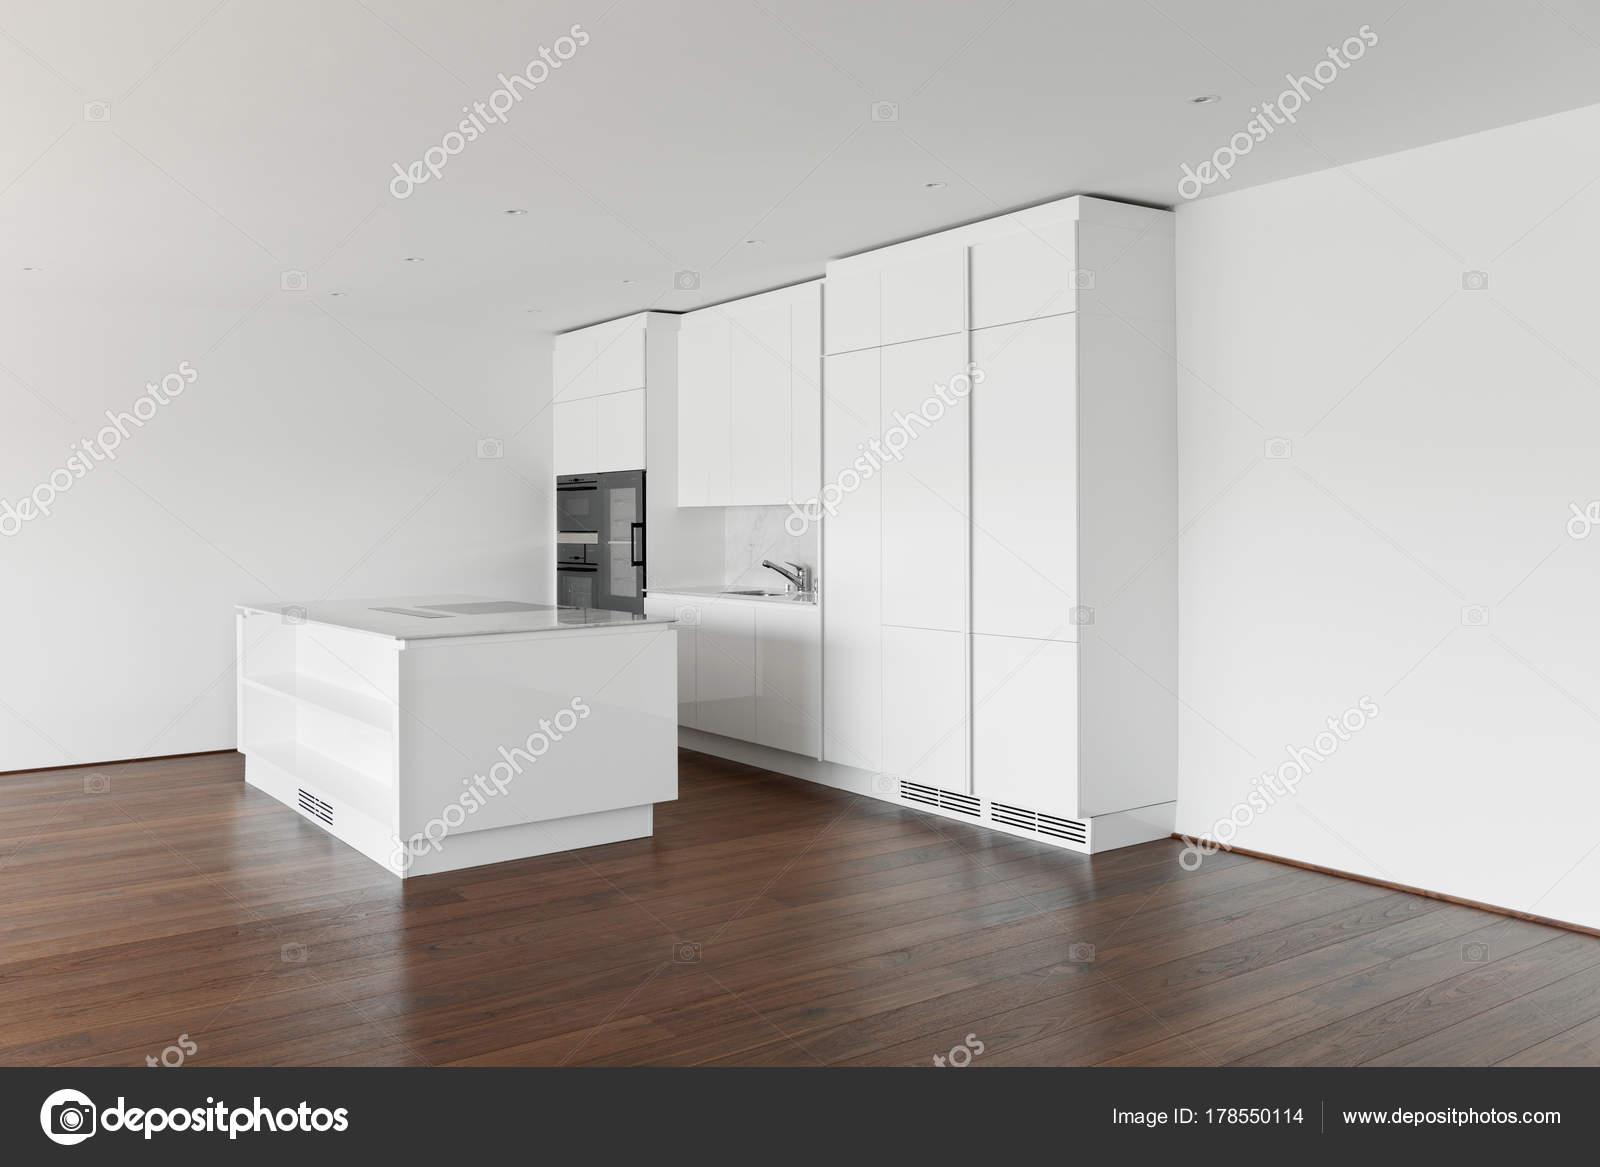 Mooie Witte Keuken : Witte moderne hoogglans keuken